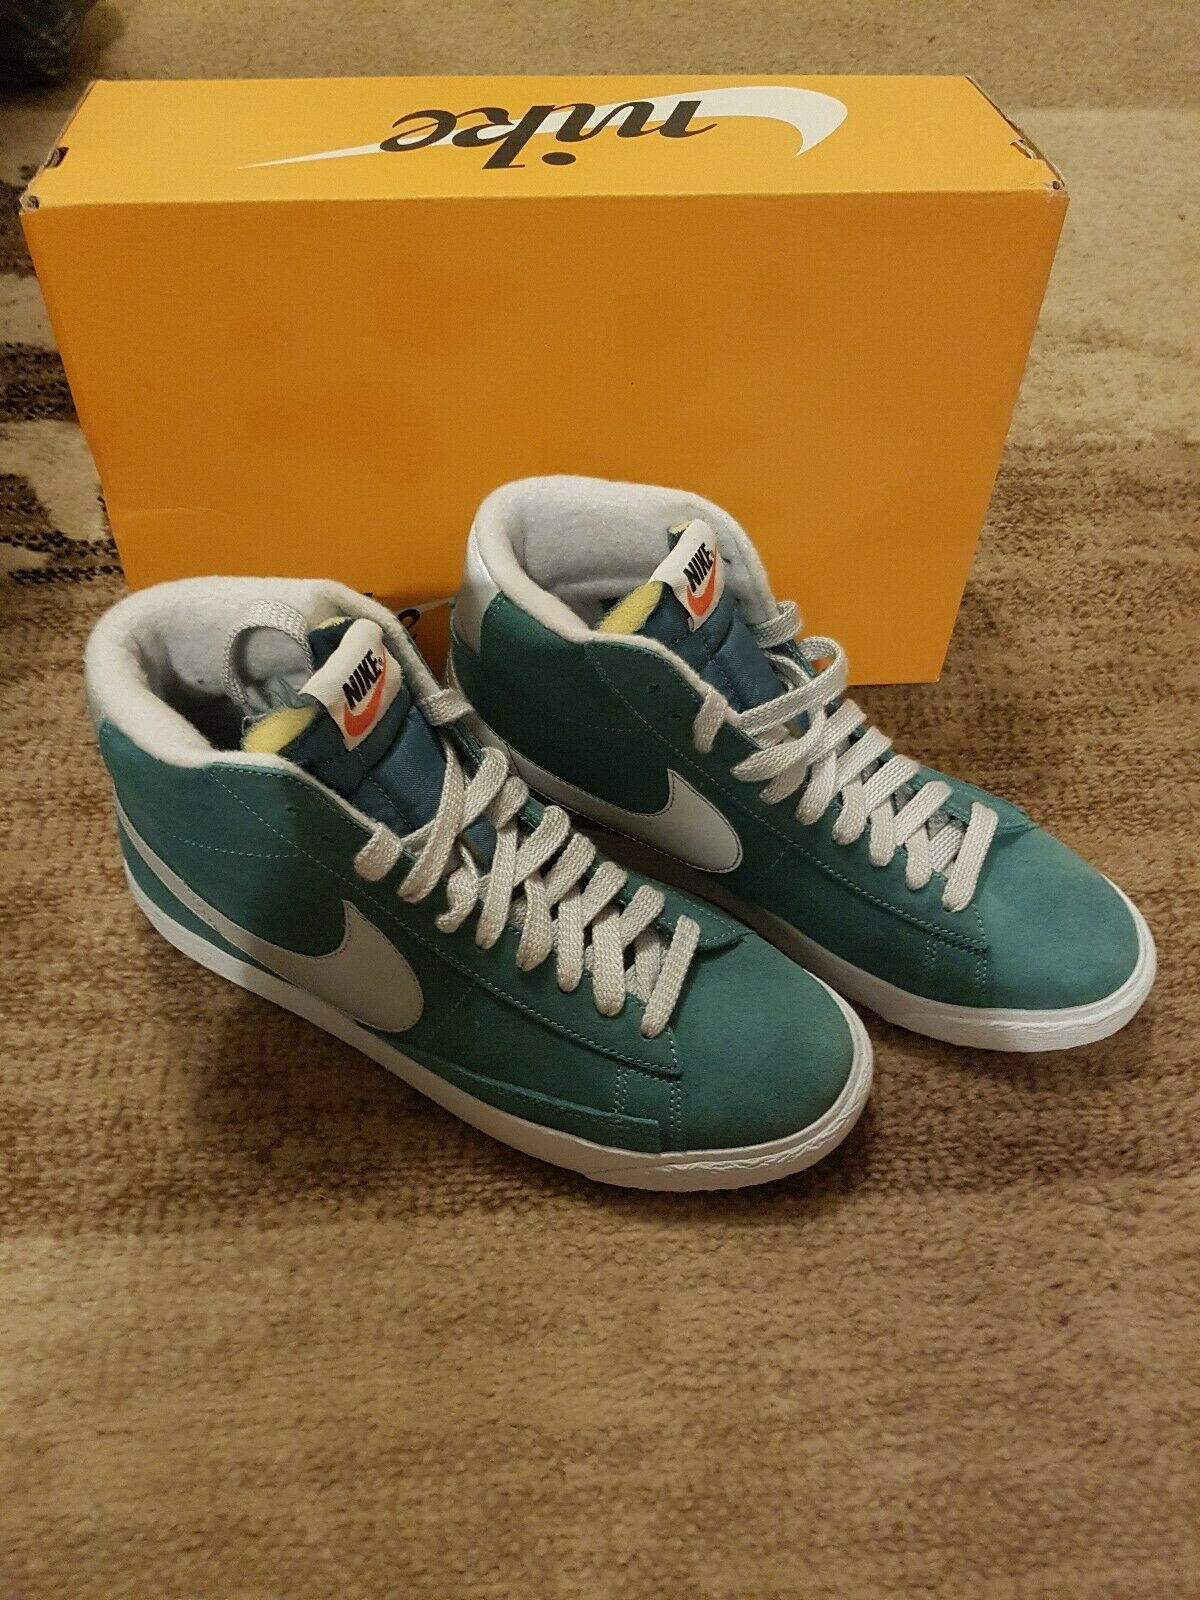 Nike Blazer Mid PRM VNTG Suede shoes - UK Size 8 - New